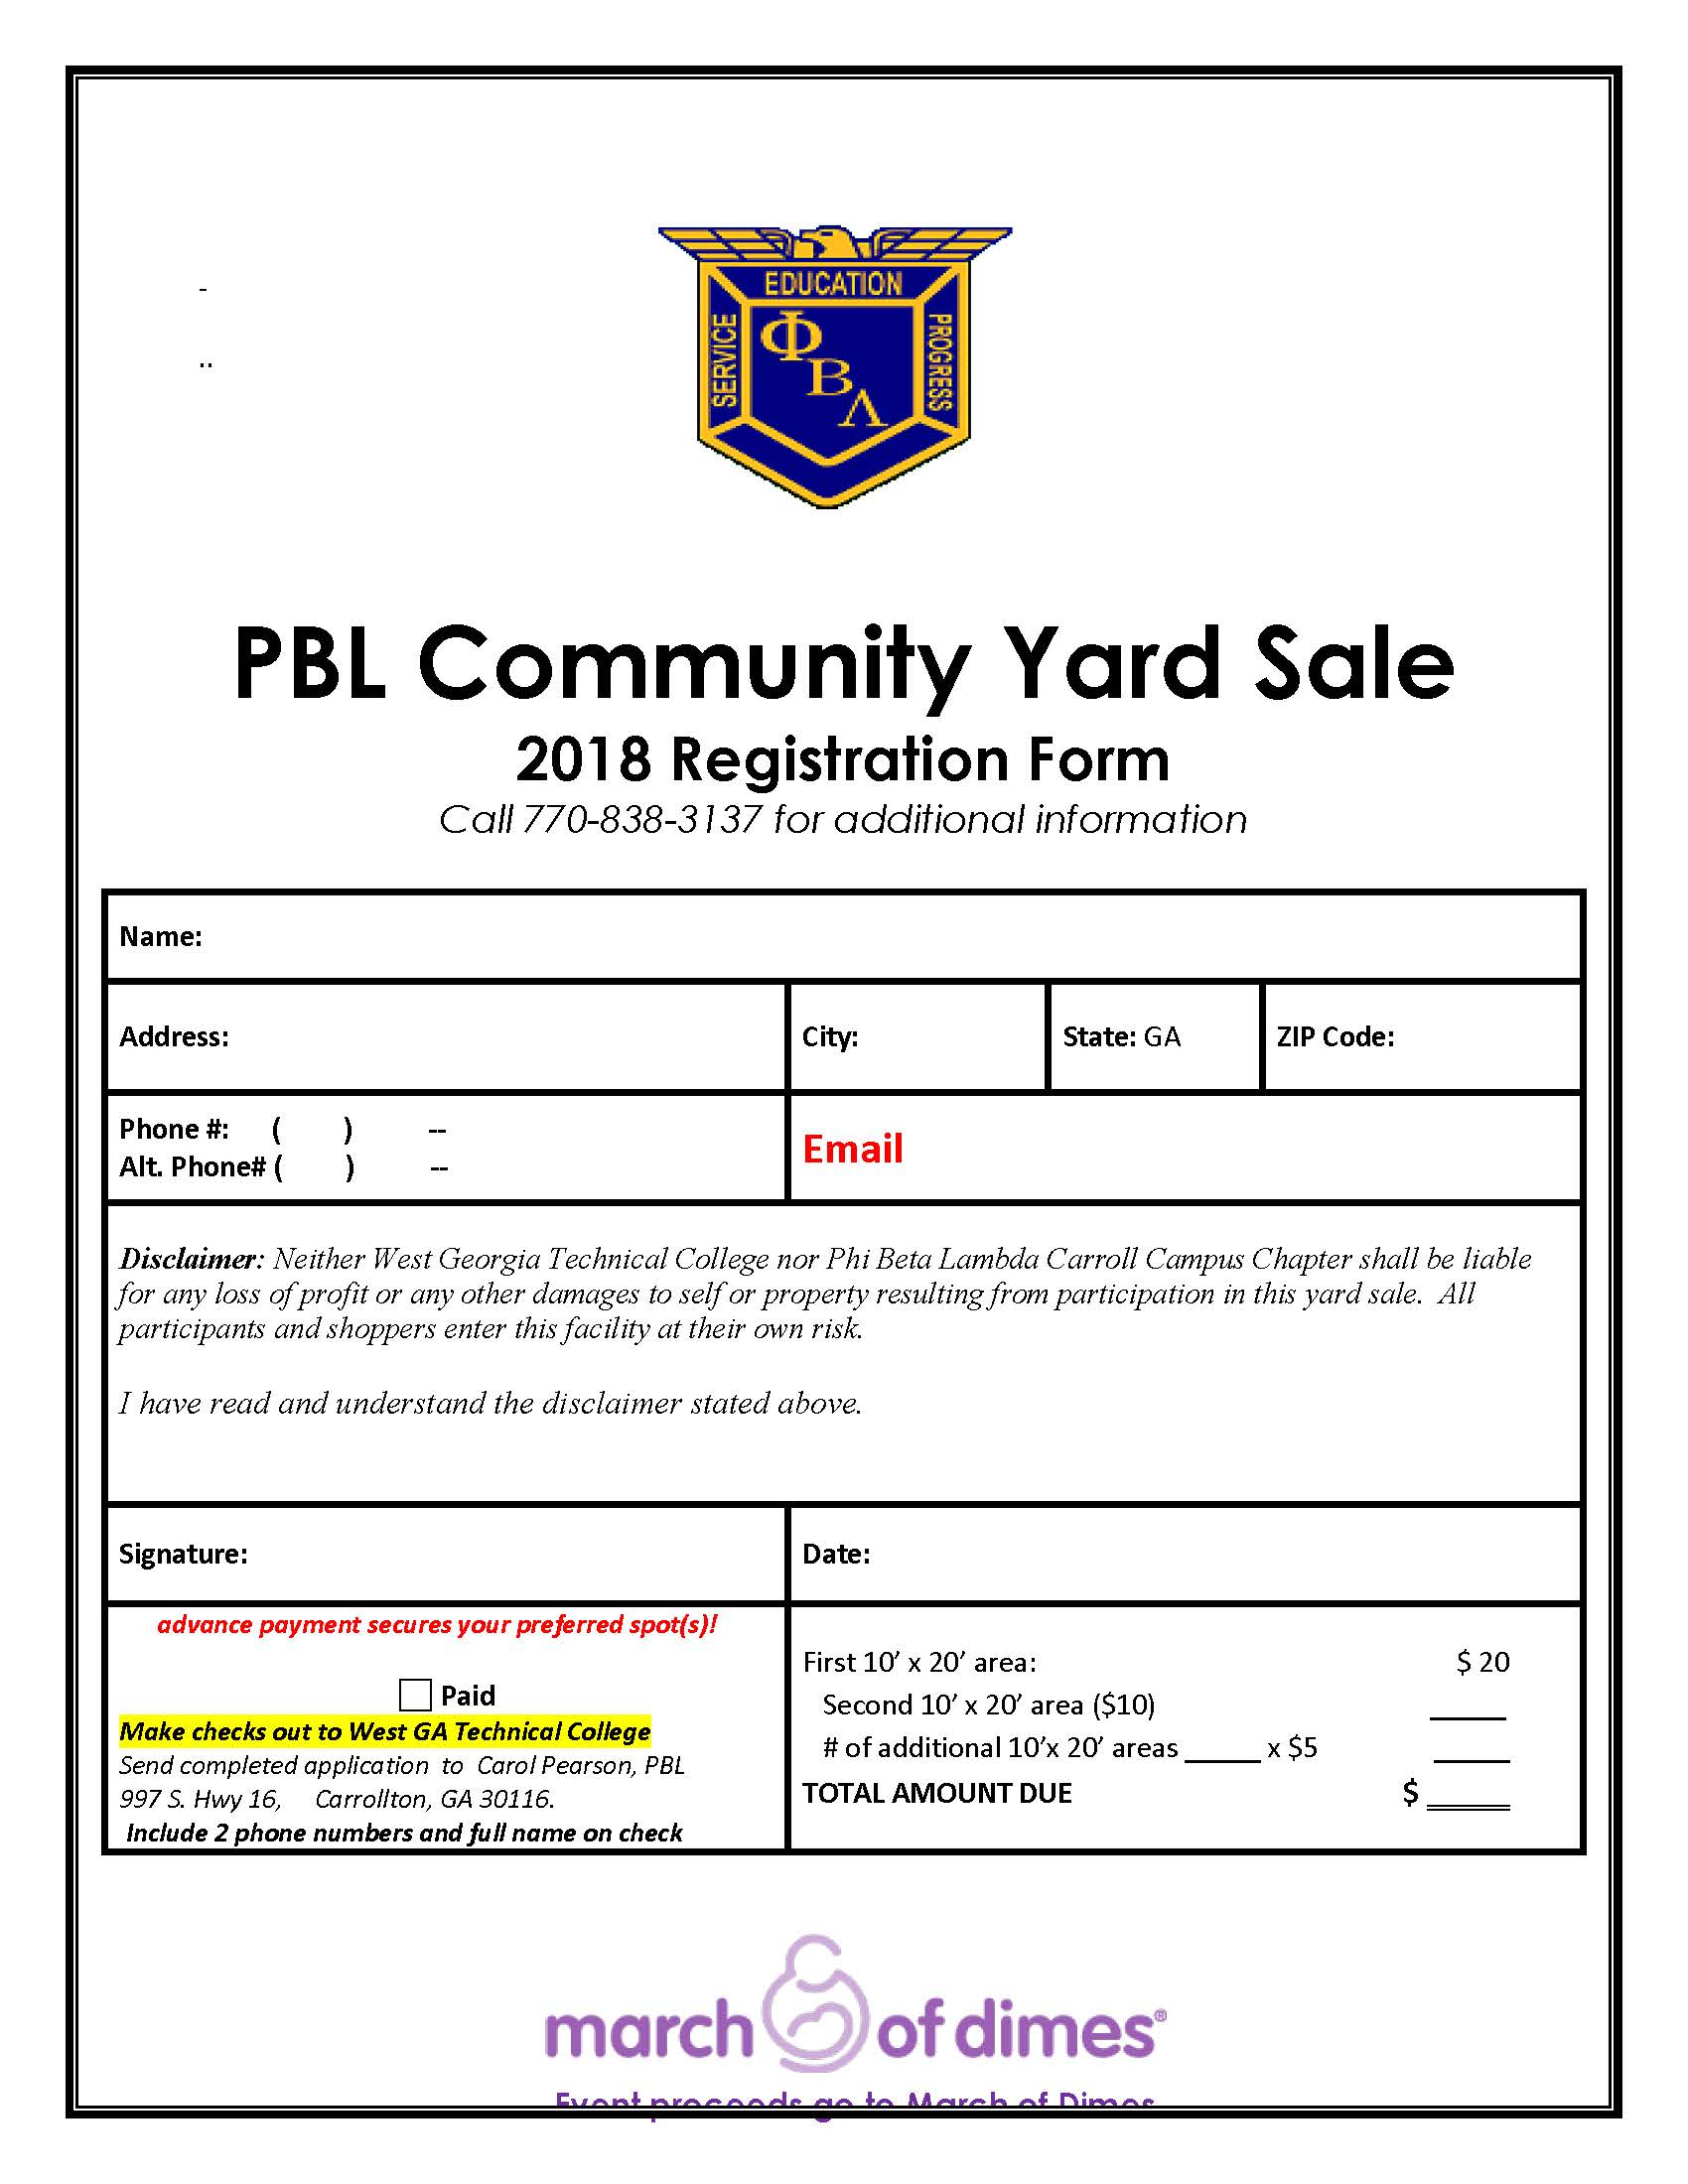 PBL Yard Sale Registration Form